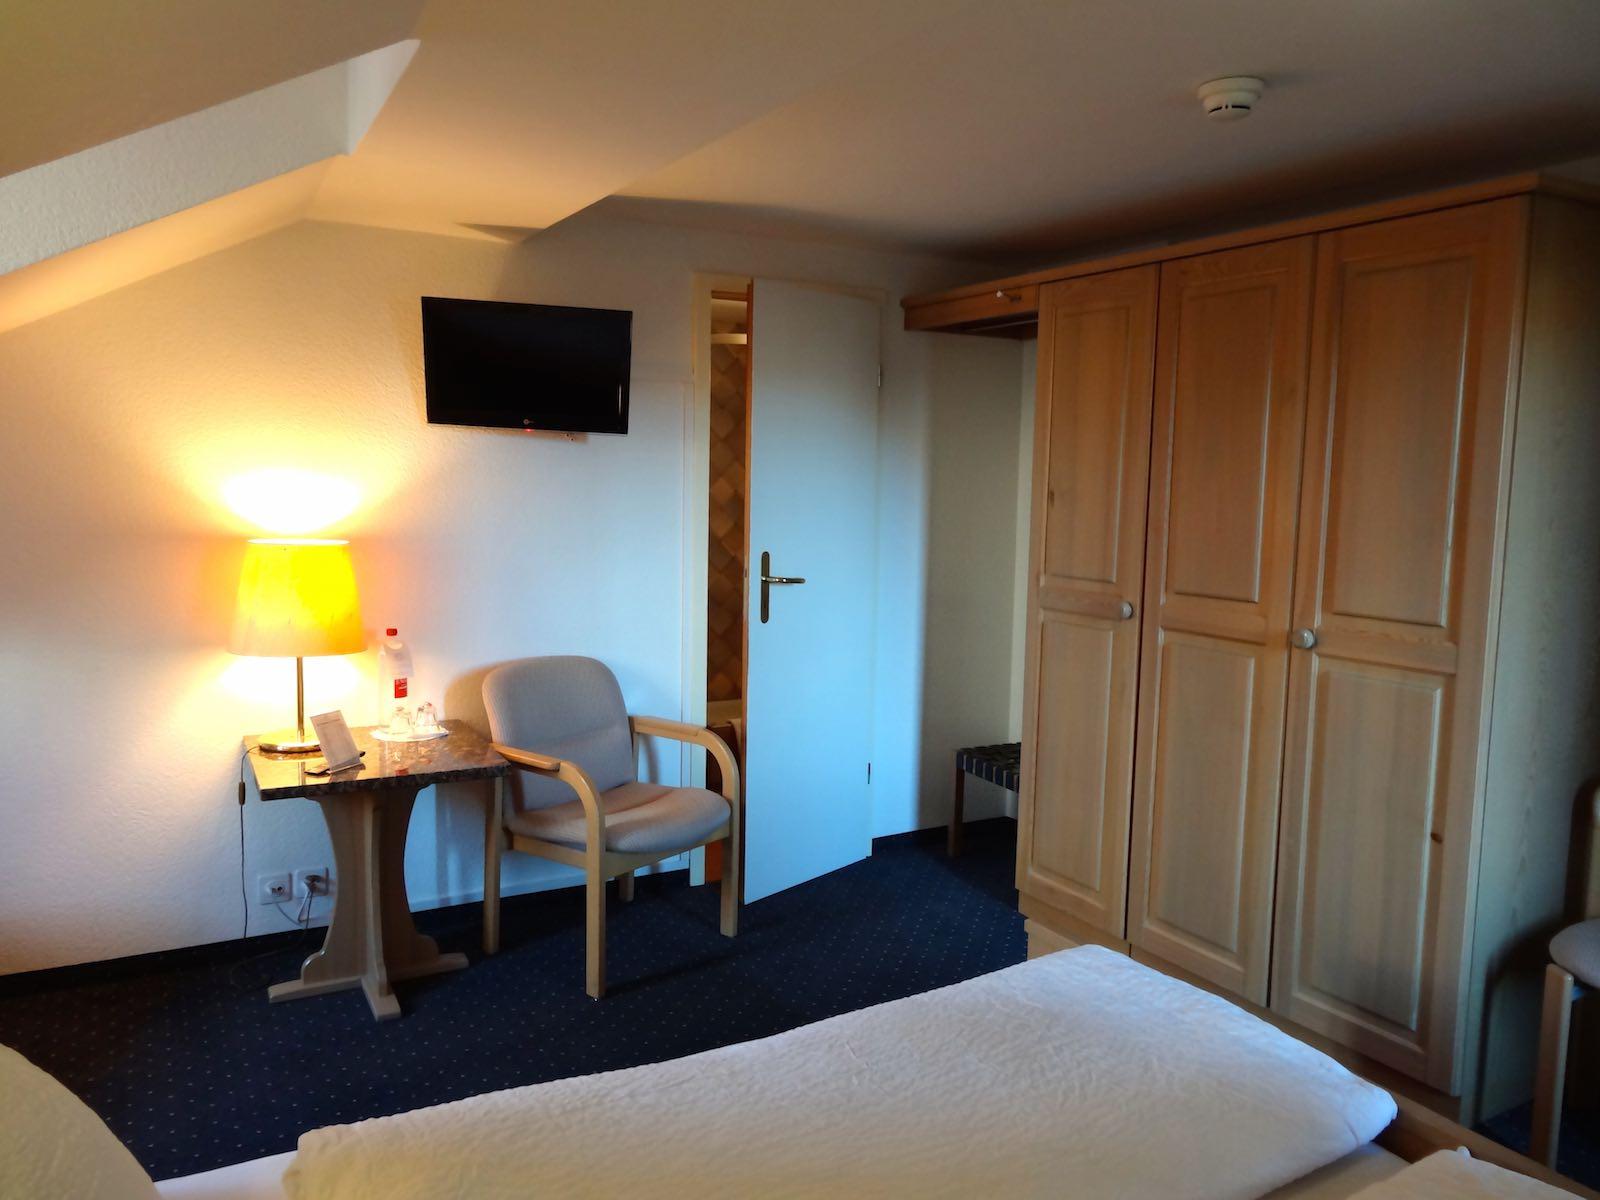 http://hoteljungfrau.ch/wp-content/uploads/2014/09/economy-zimmer-4.jpg